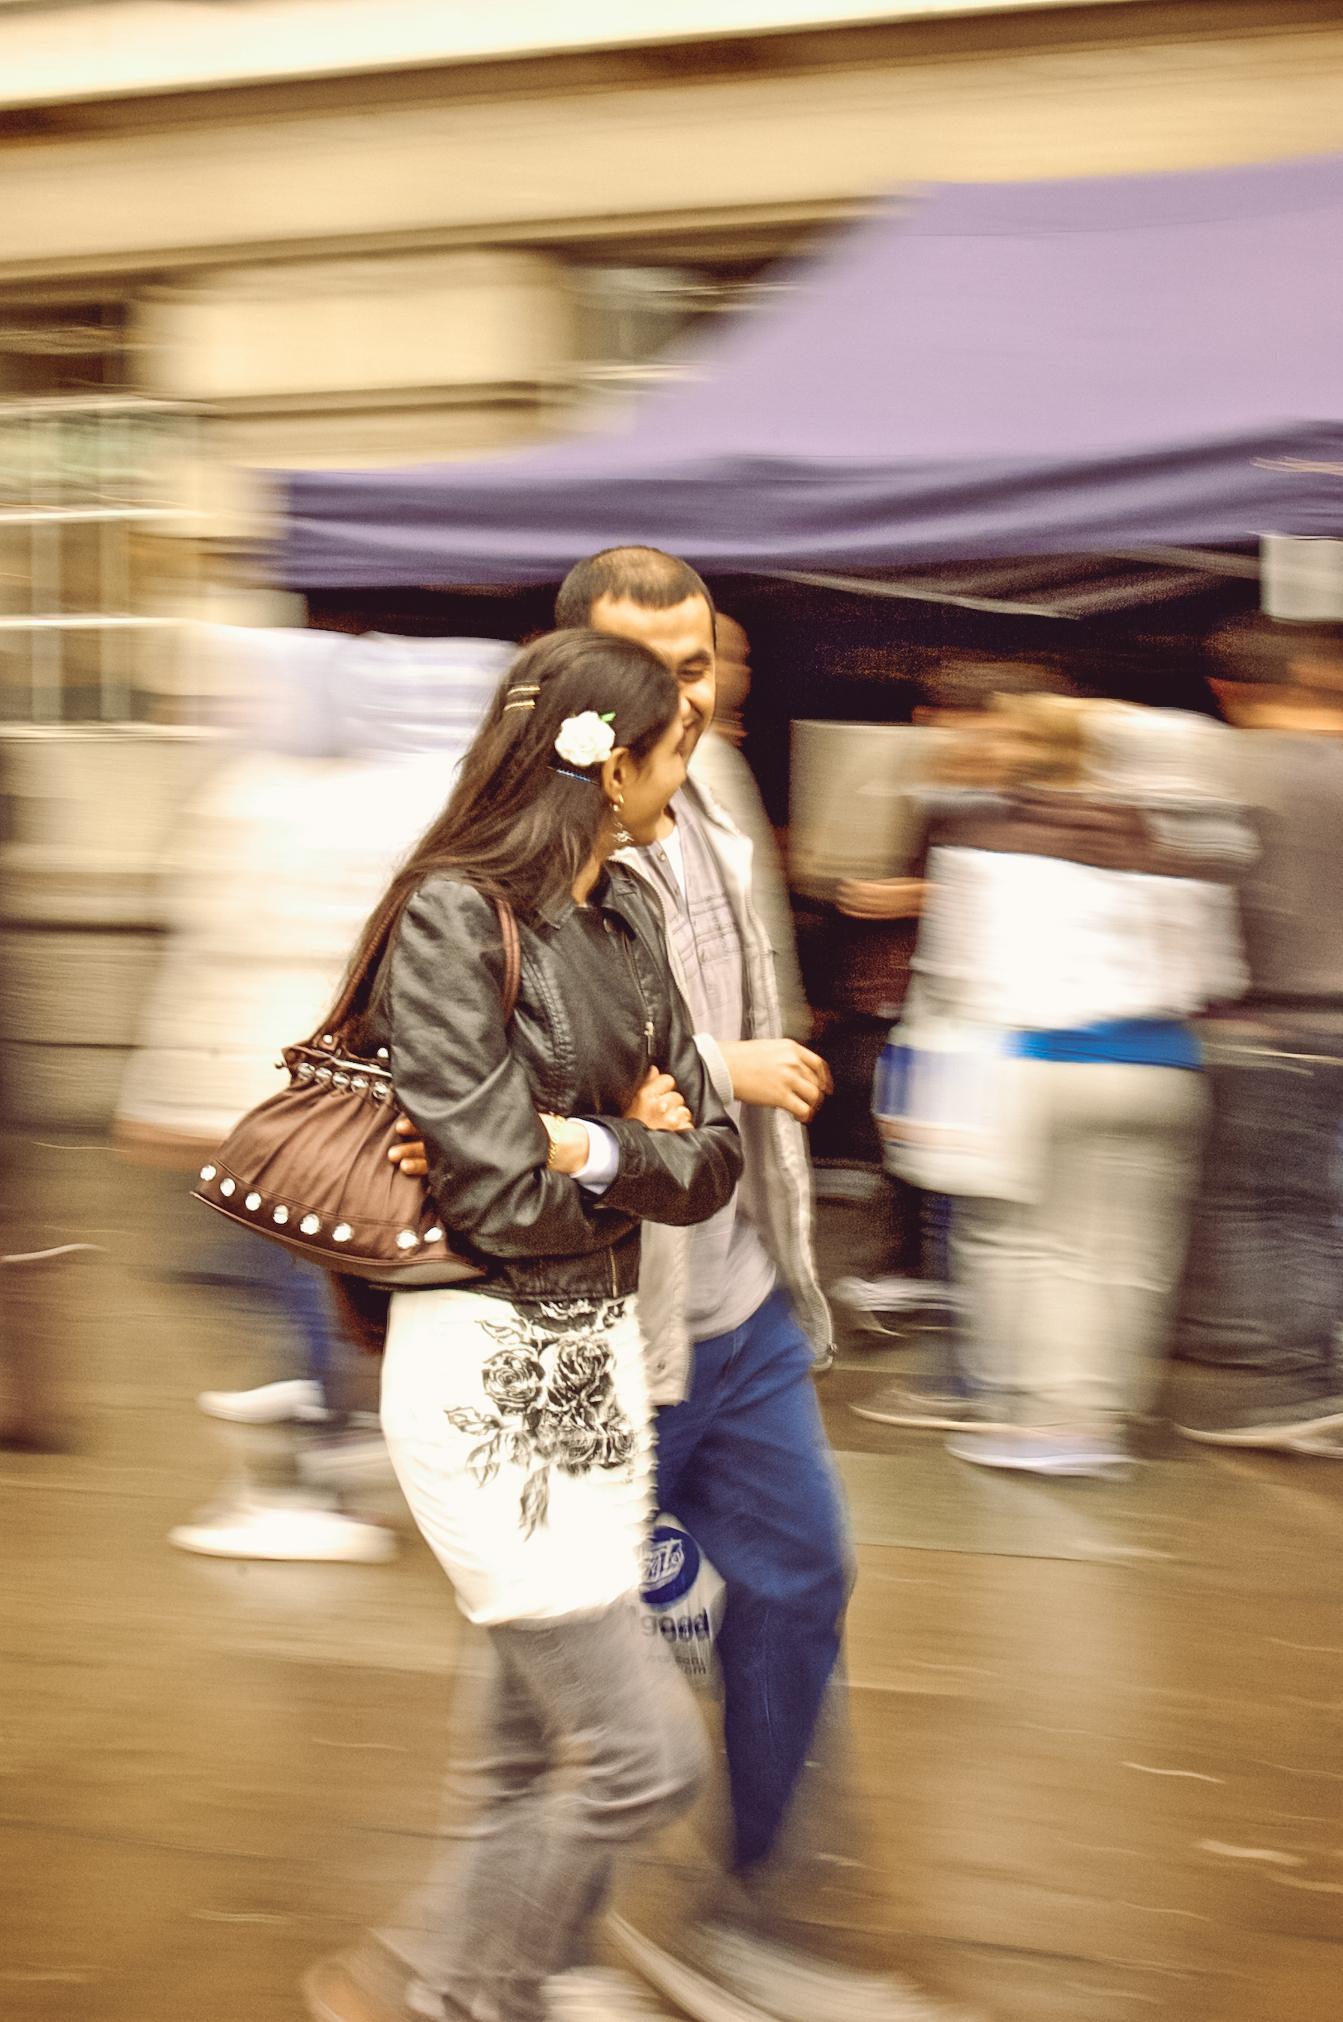 luzod-design-co-mae-london-people-watch-couple.jpg